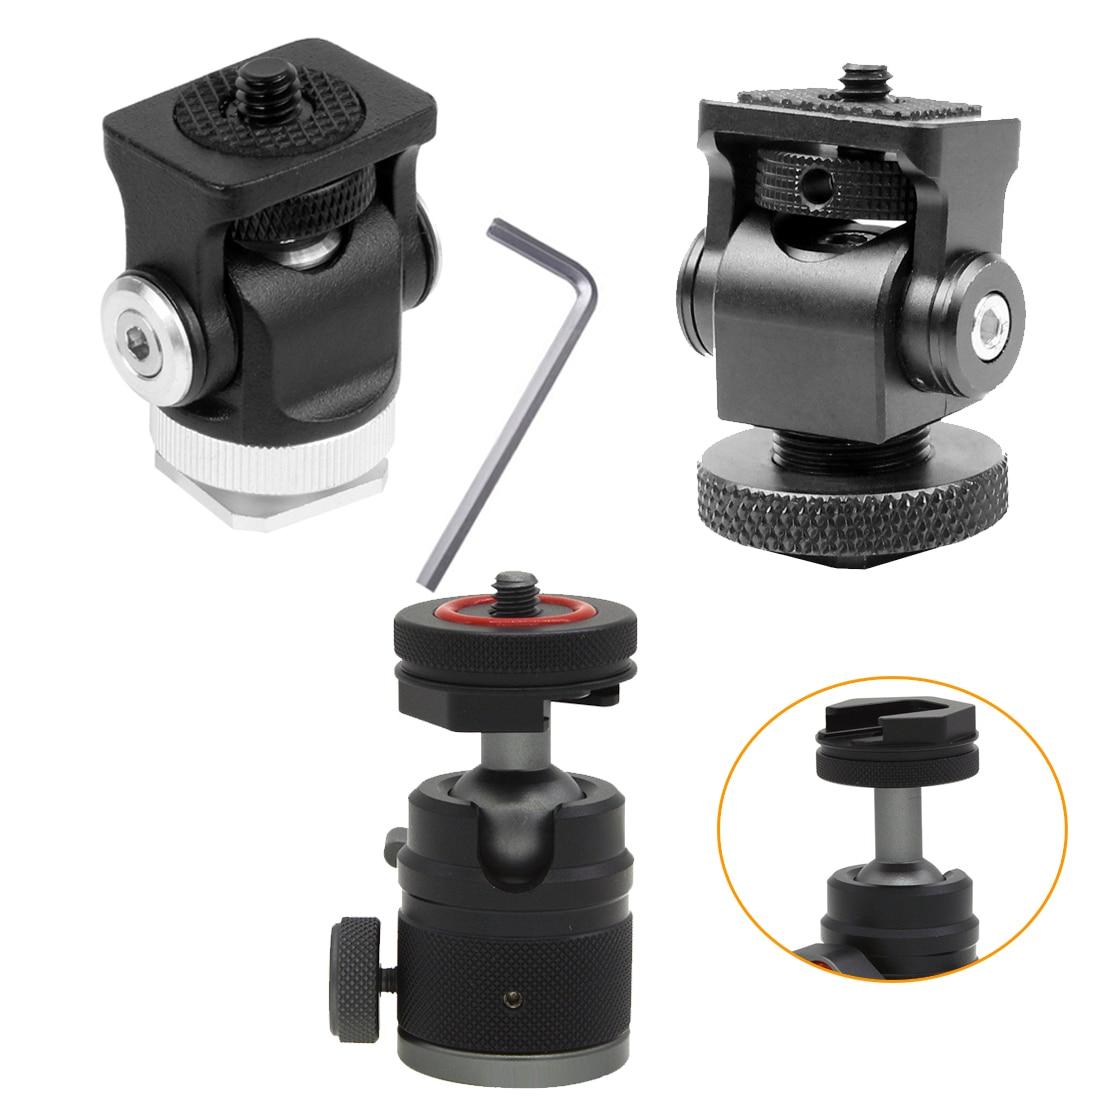 Hot Shoe Mount Mini BallHead 360 Panoramic Monitor Holder Camera Pan Tilt 1/4'' Cold Shoe Adapter for Tripod Light Flash Bracket